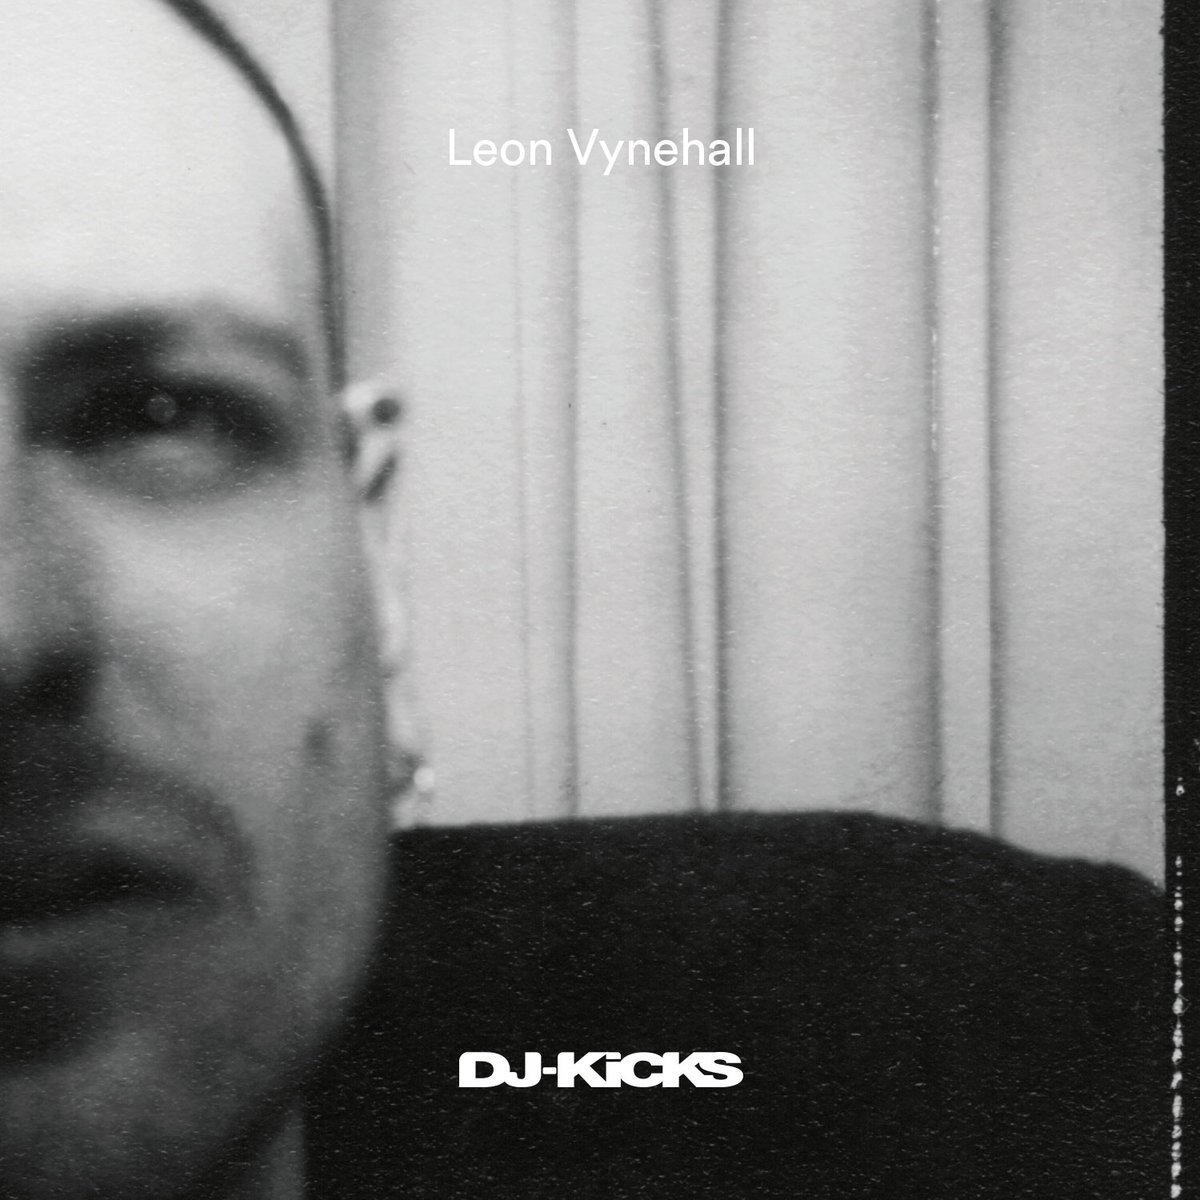 DJ-Kicks: Leon Vynehall | Leon Vynehall